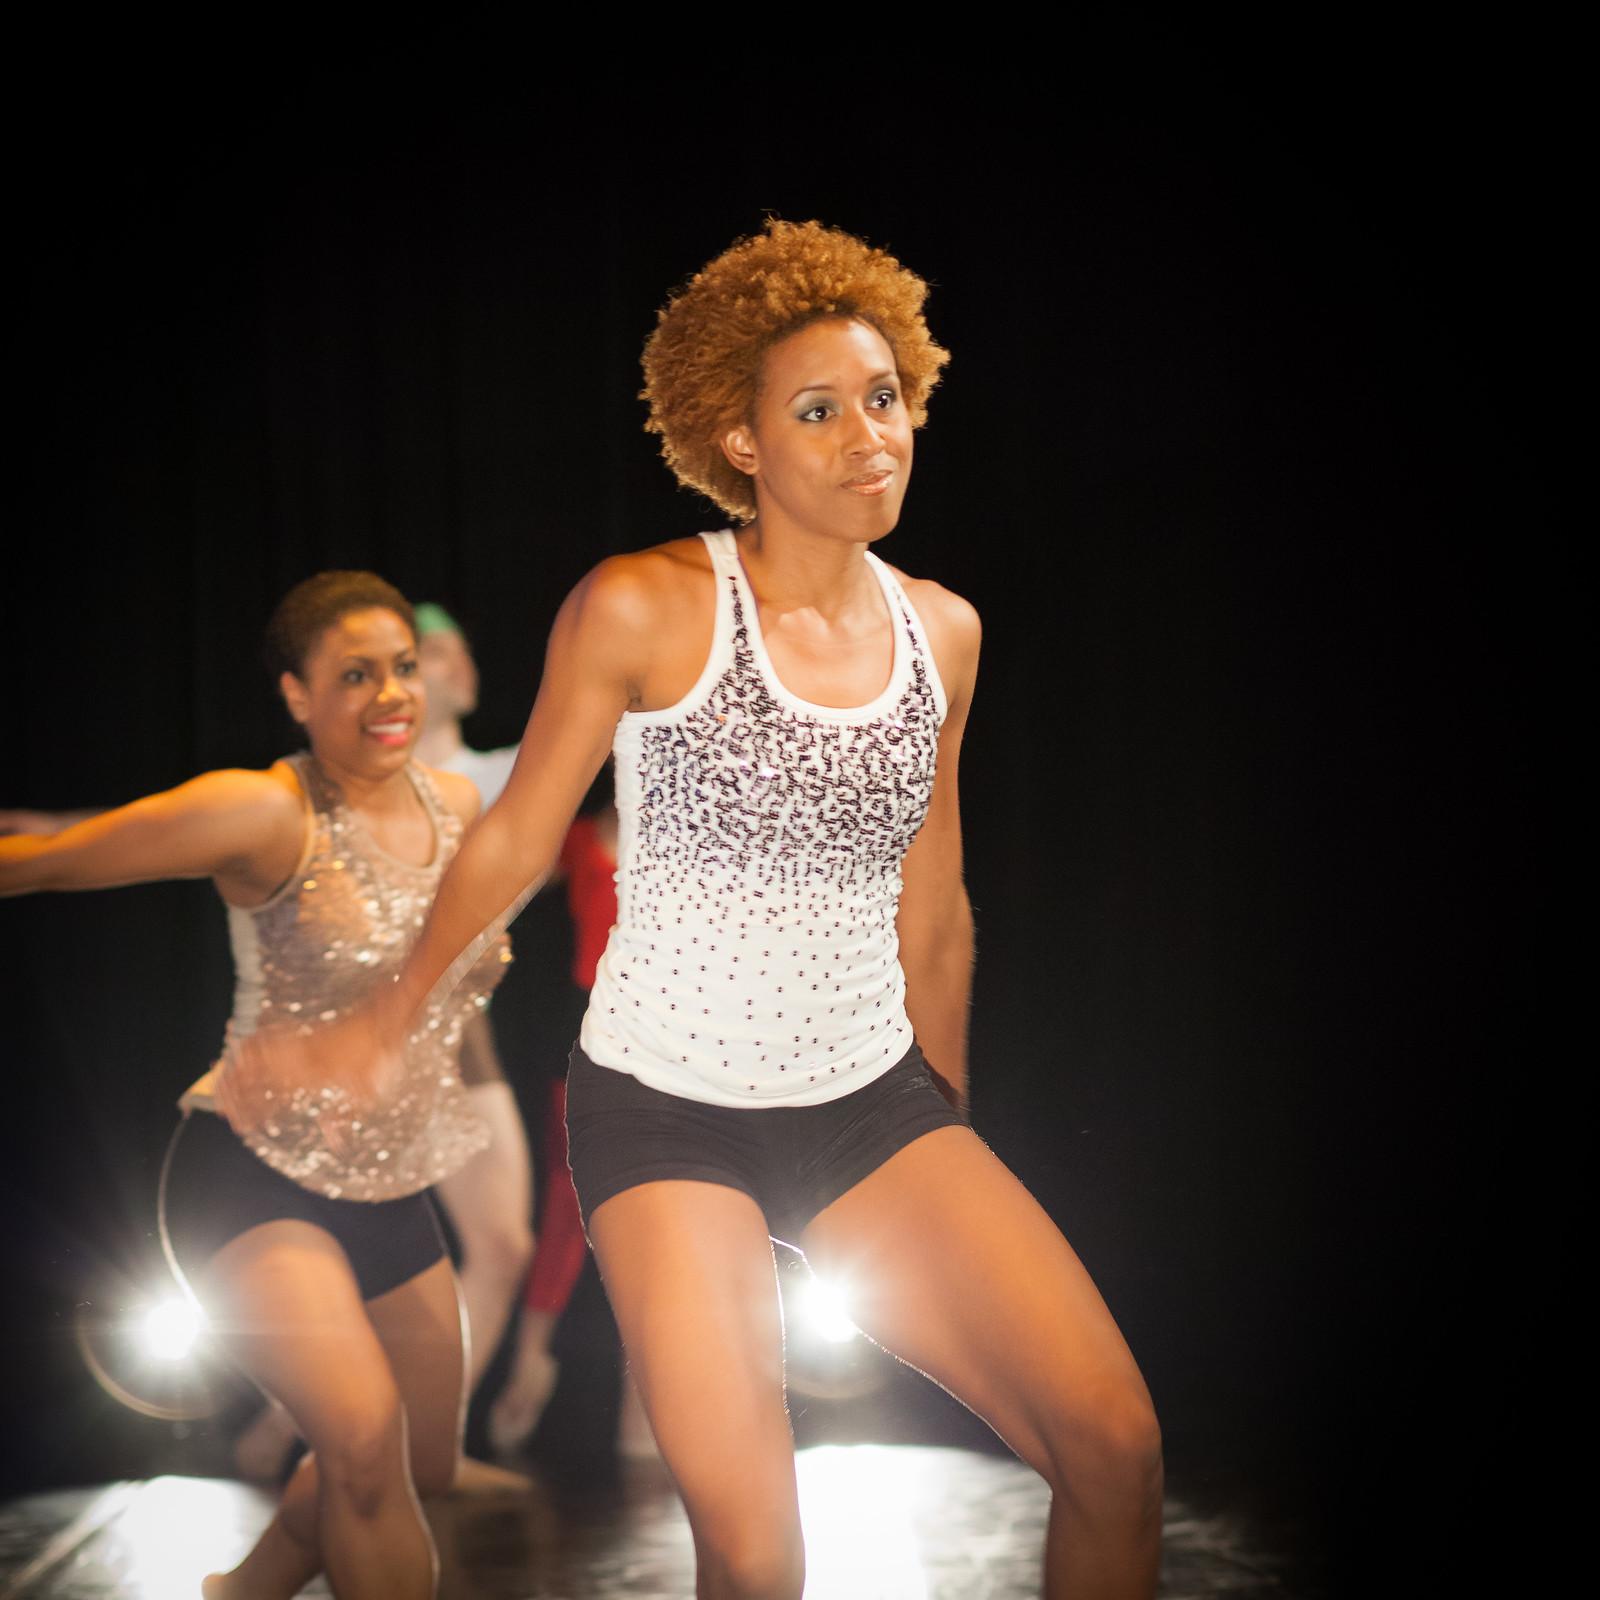 Dancers by wwward0